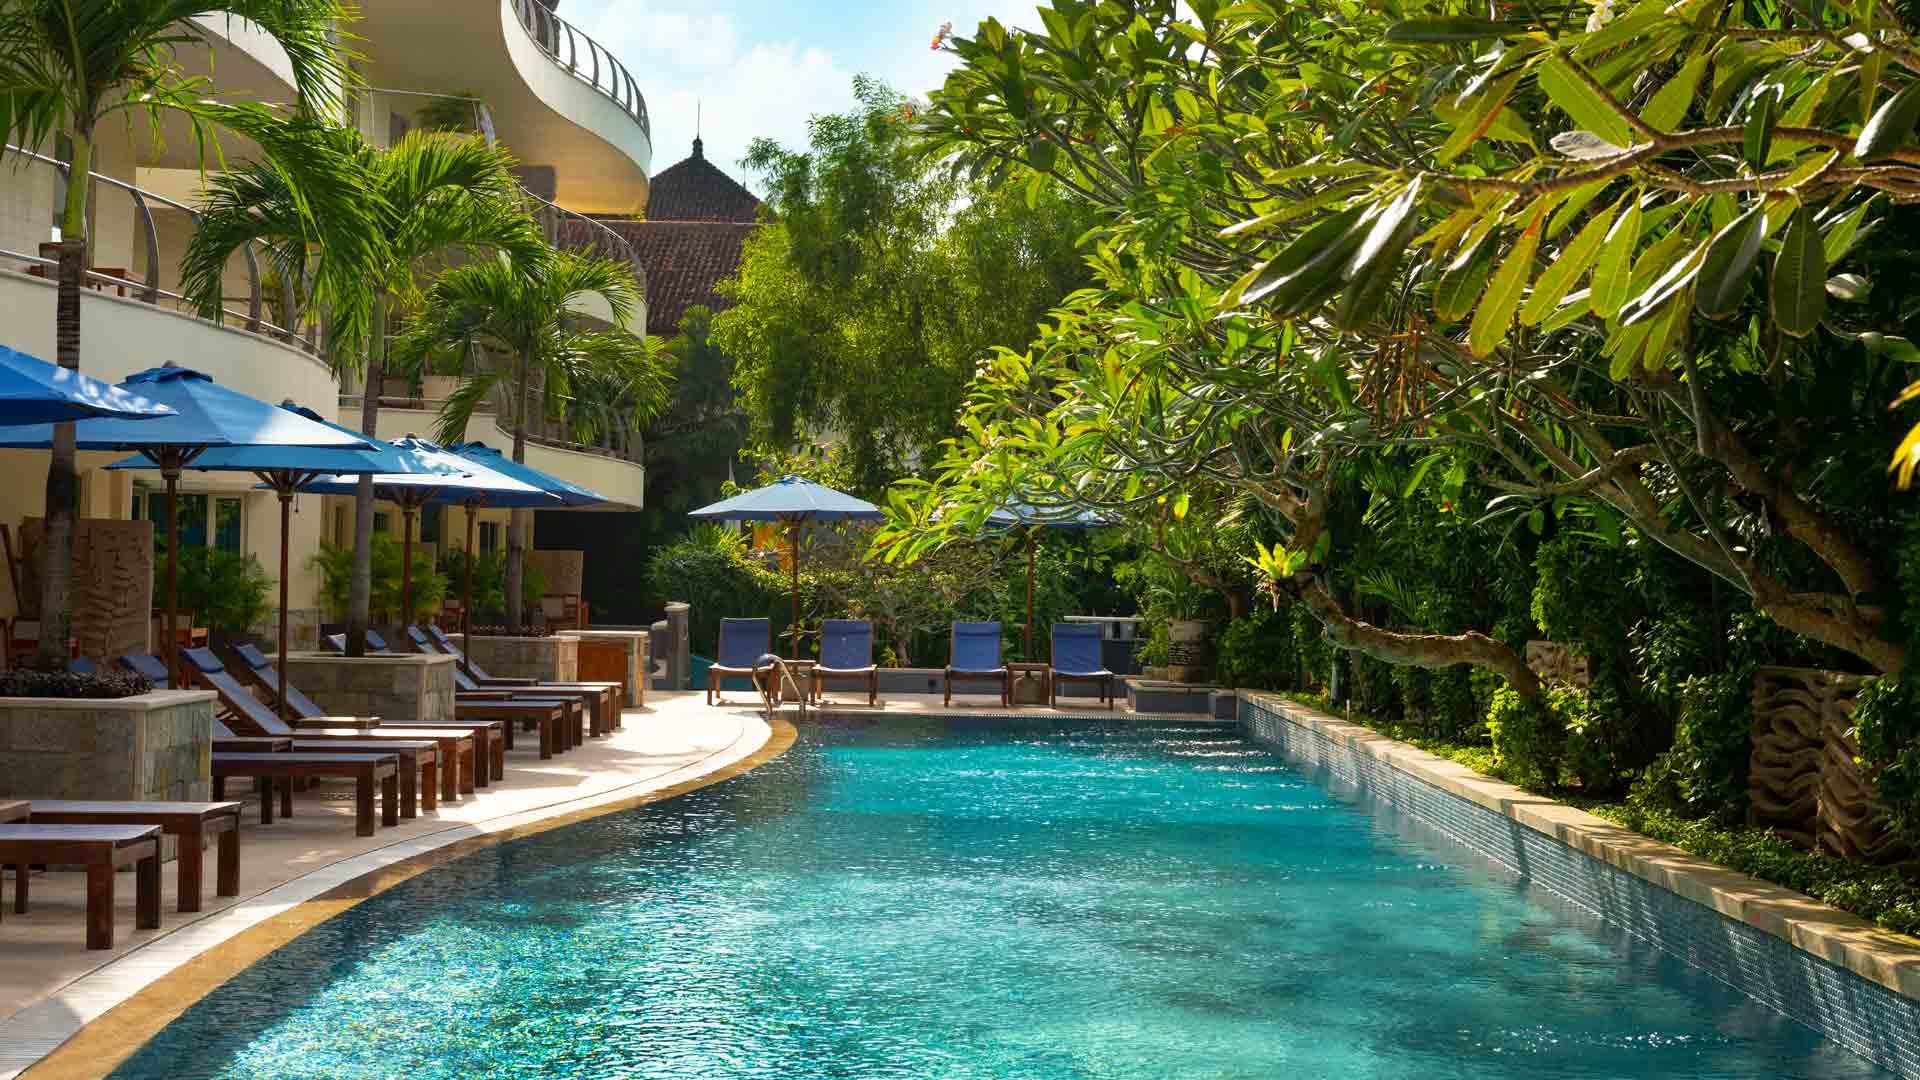 https://assets.anantara.com/image/upload/q_auto/media/minor/anantara/images/anantara-vacation-club-legian-bali/the-resort/anantara_vacation_club_legian_pool_desktop_banner_1920x1080.jpg